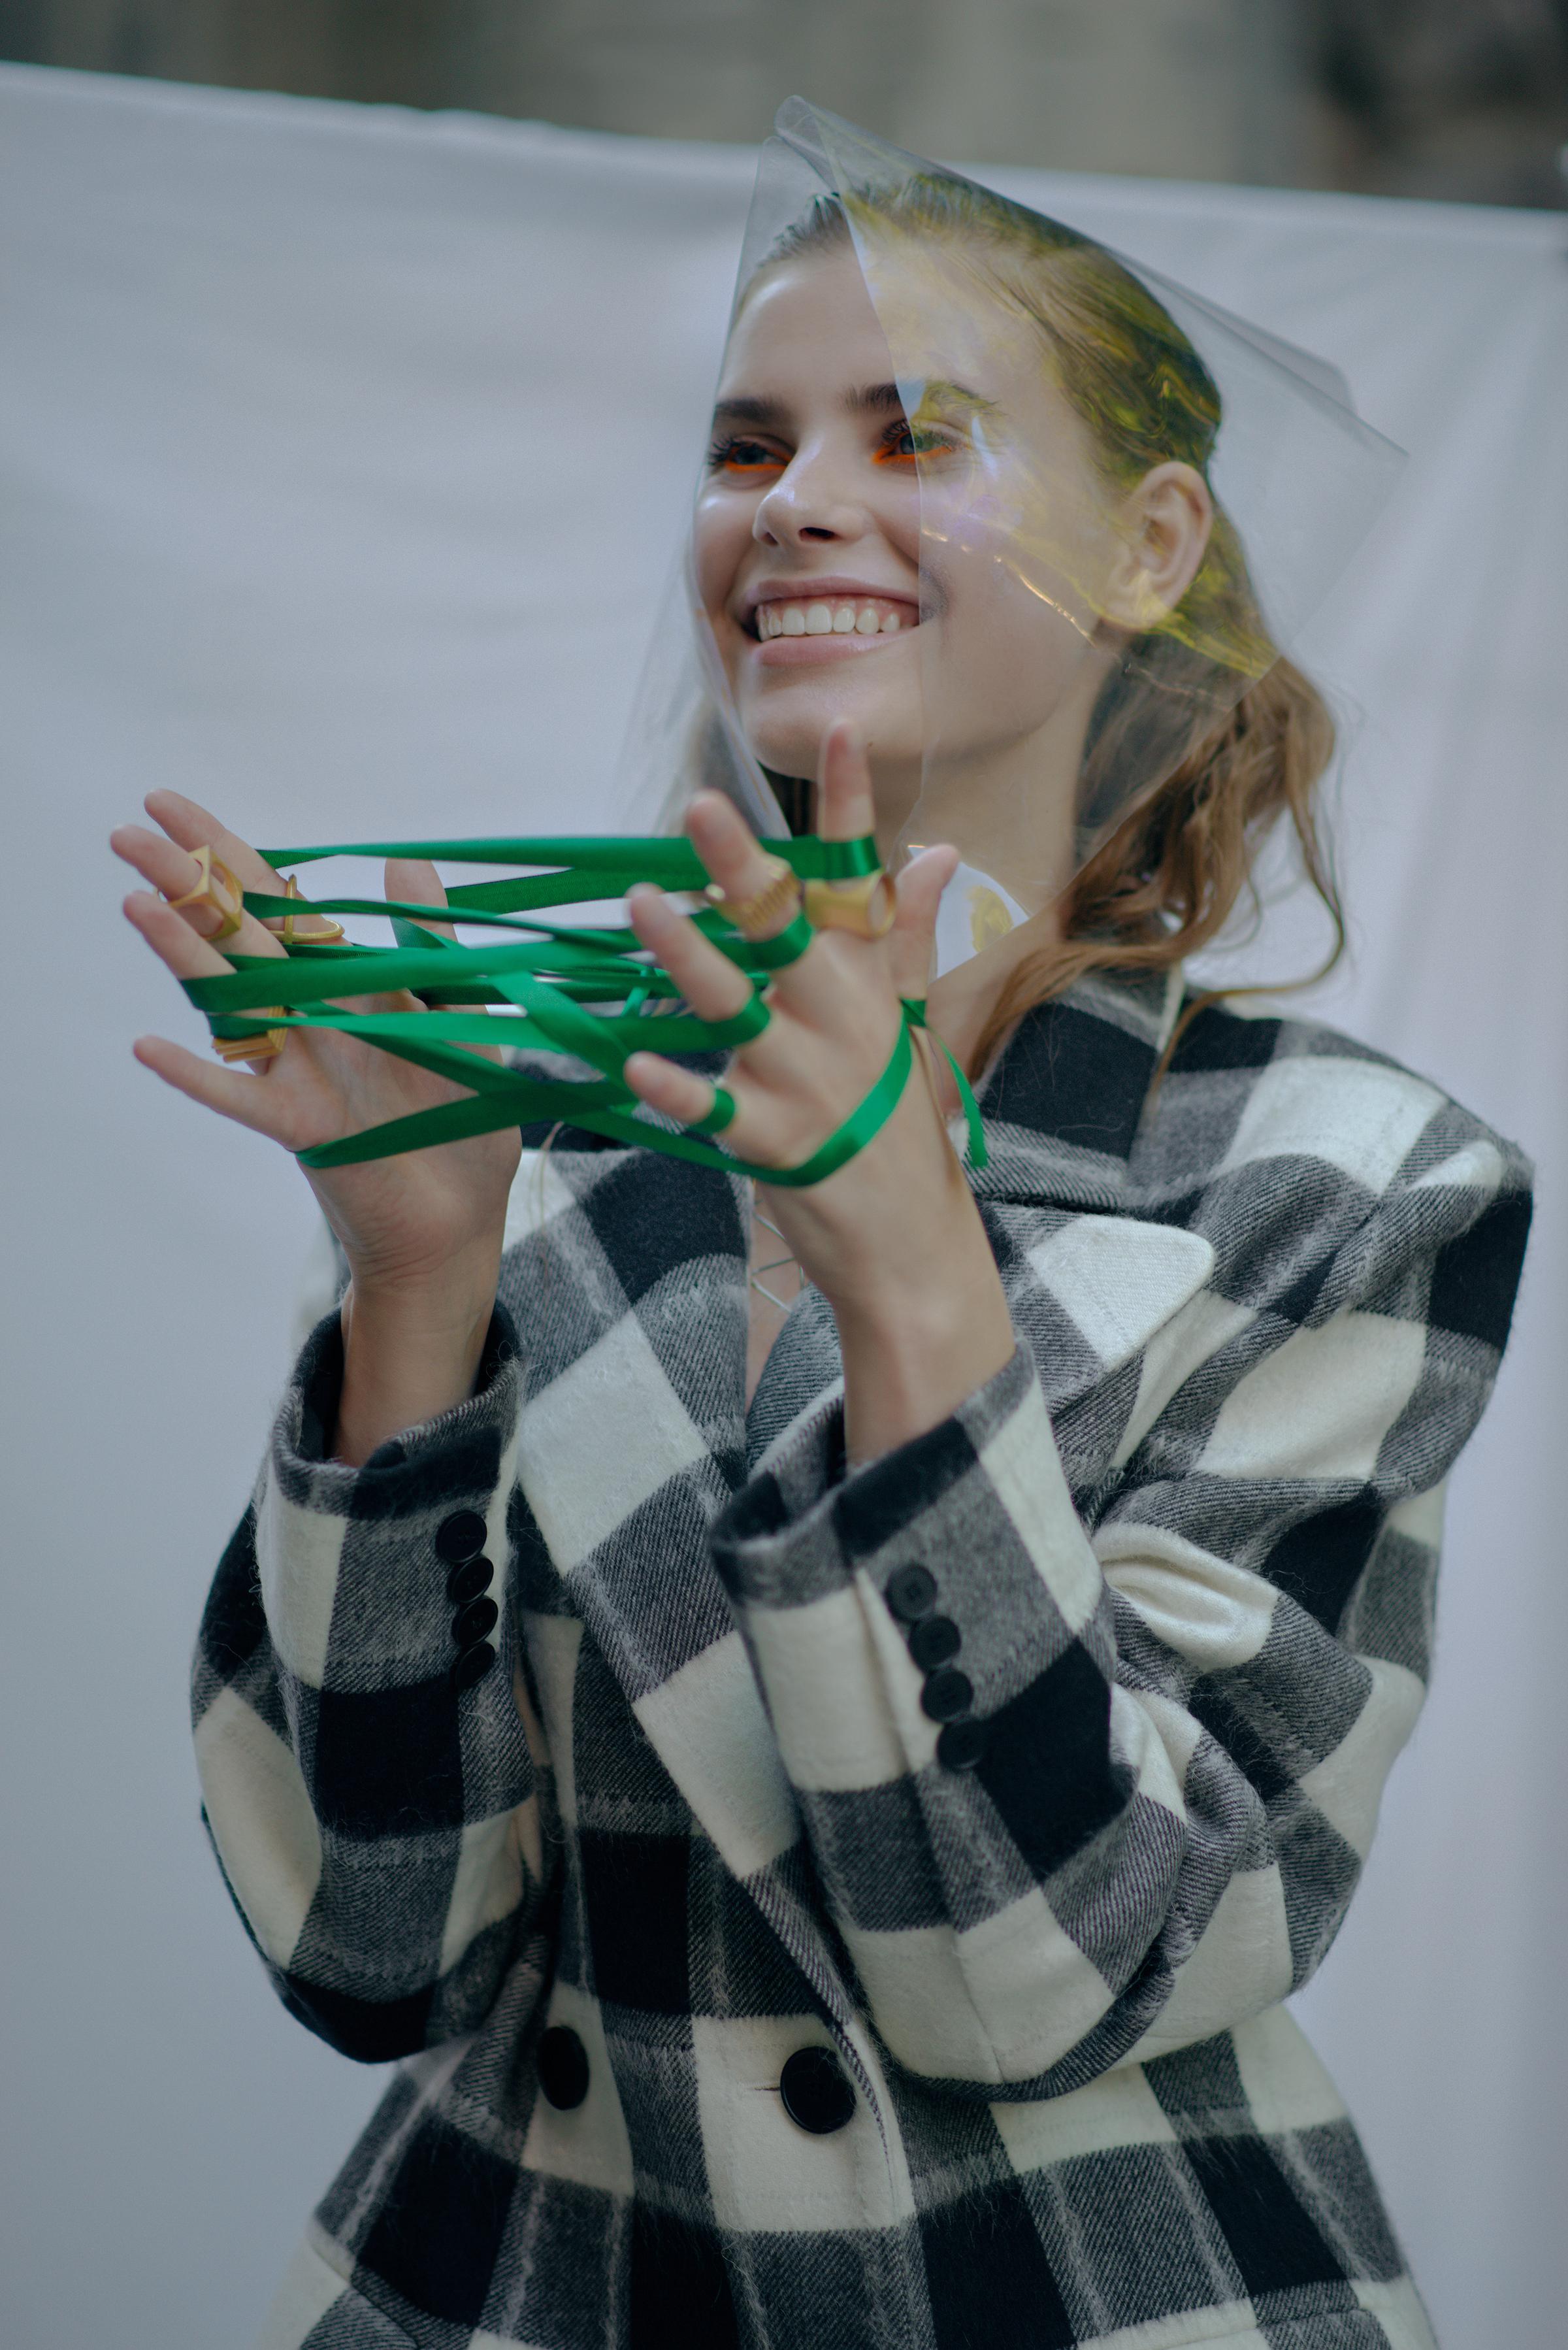 Jacket ELENAREVA Babushka Stylist's own Necklace Stylist's own Rings ABCDRINGS